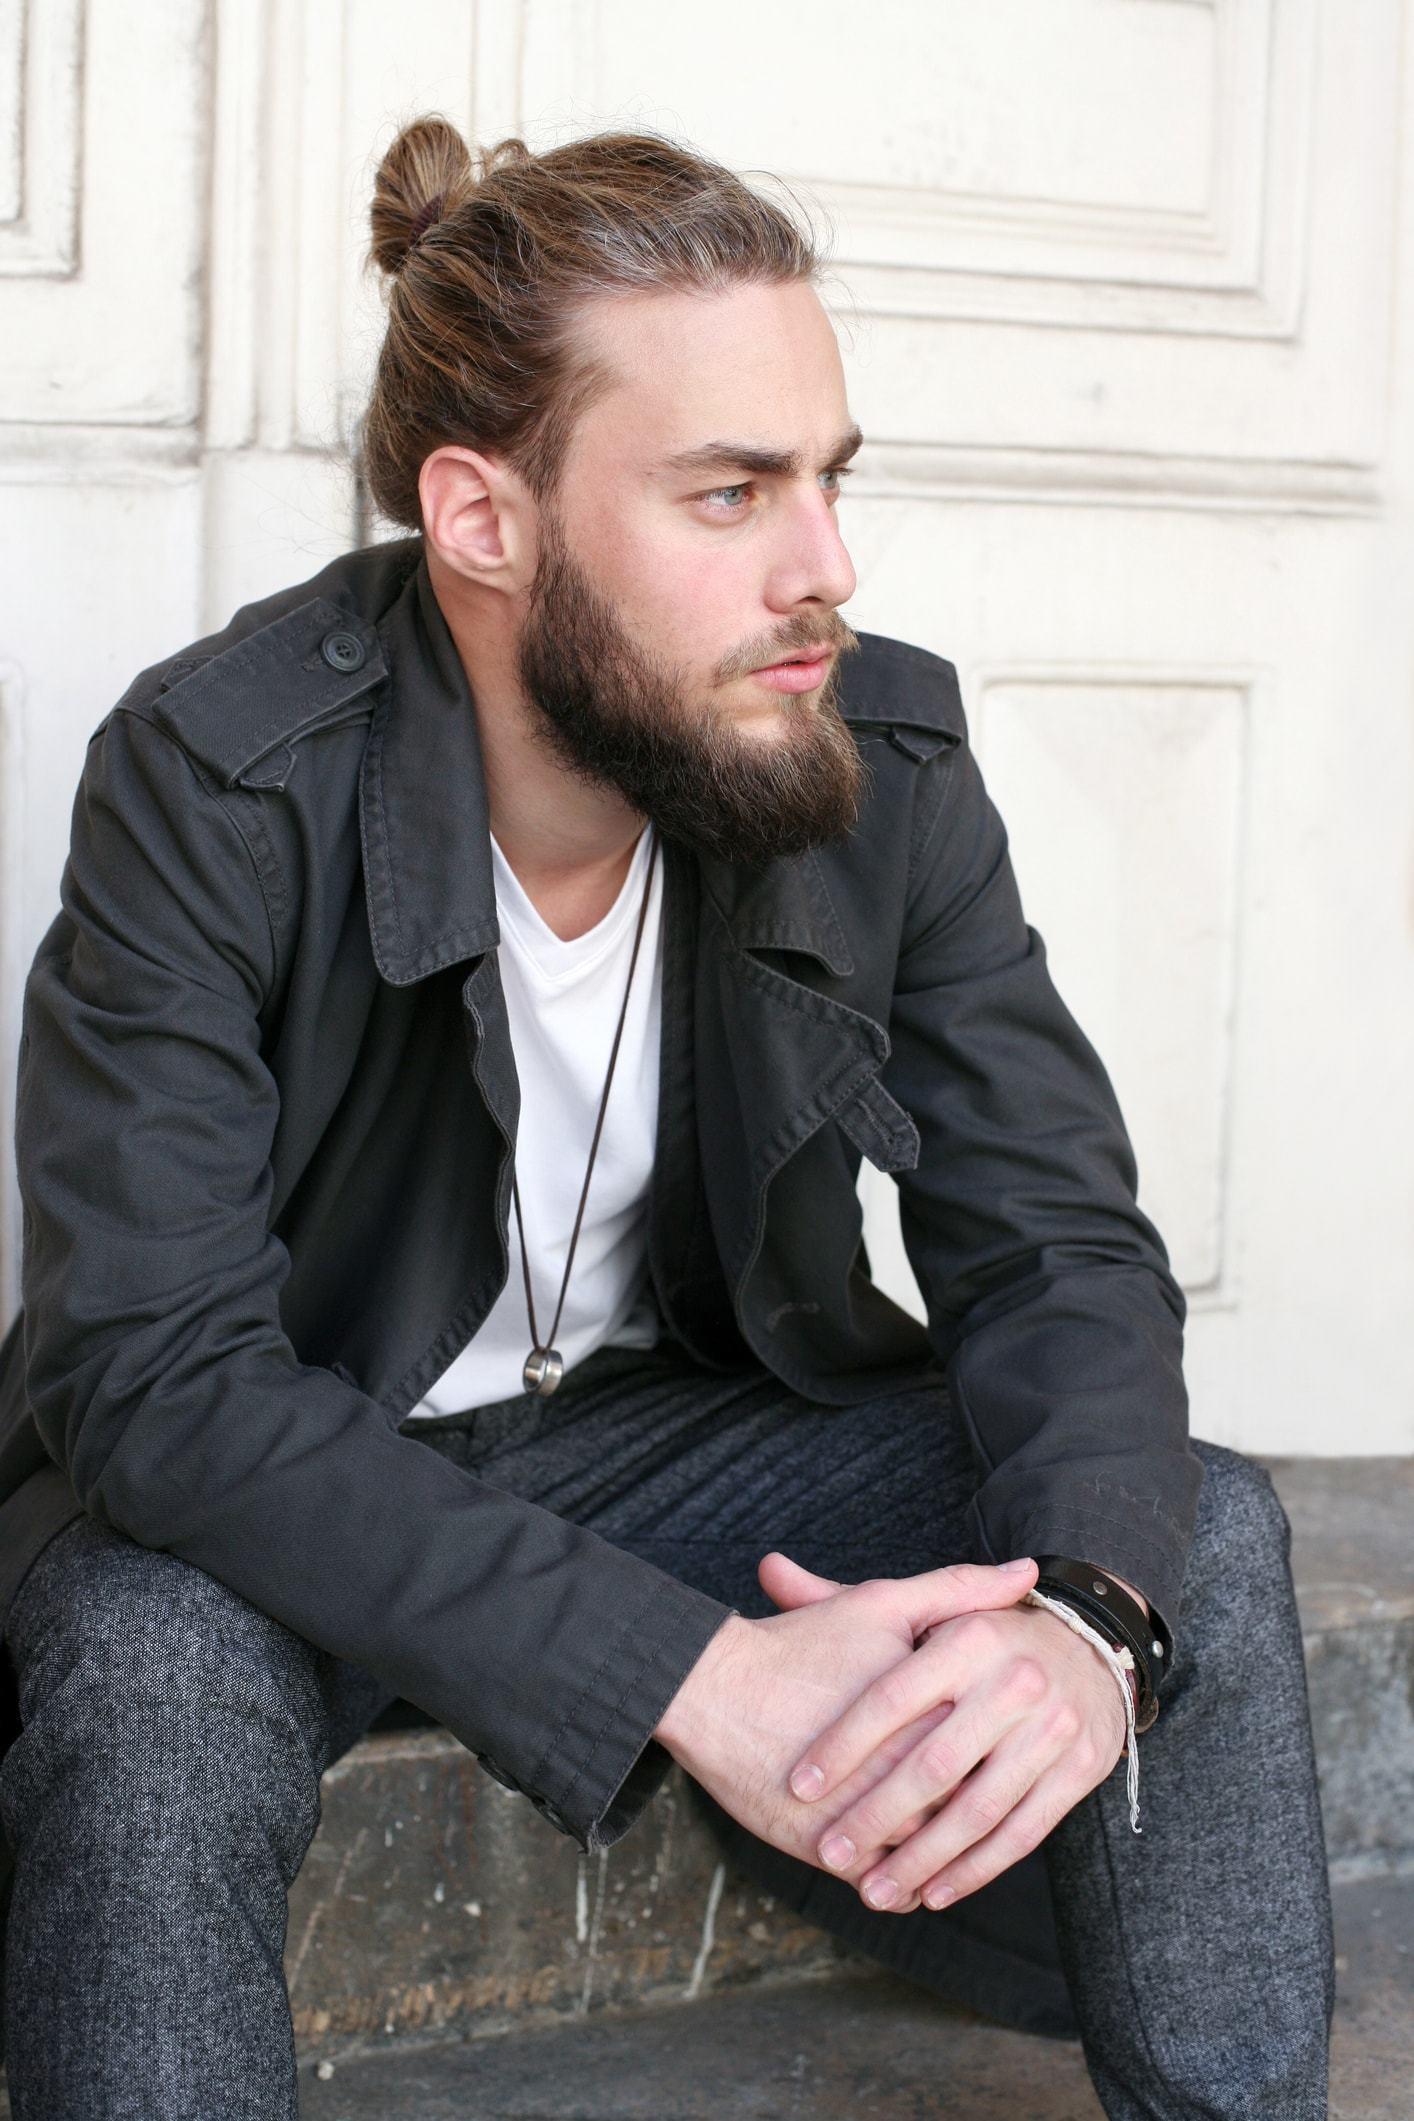 mens hairstyles 2017 man bun beard